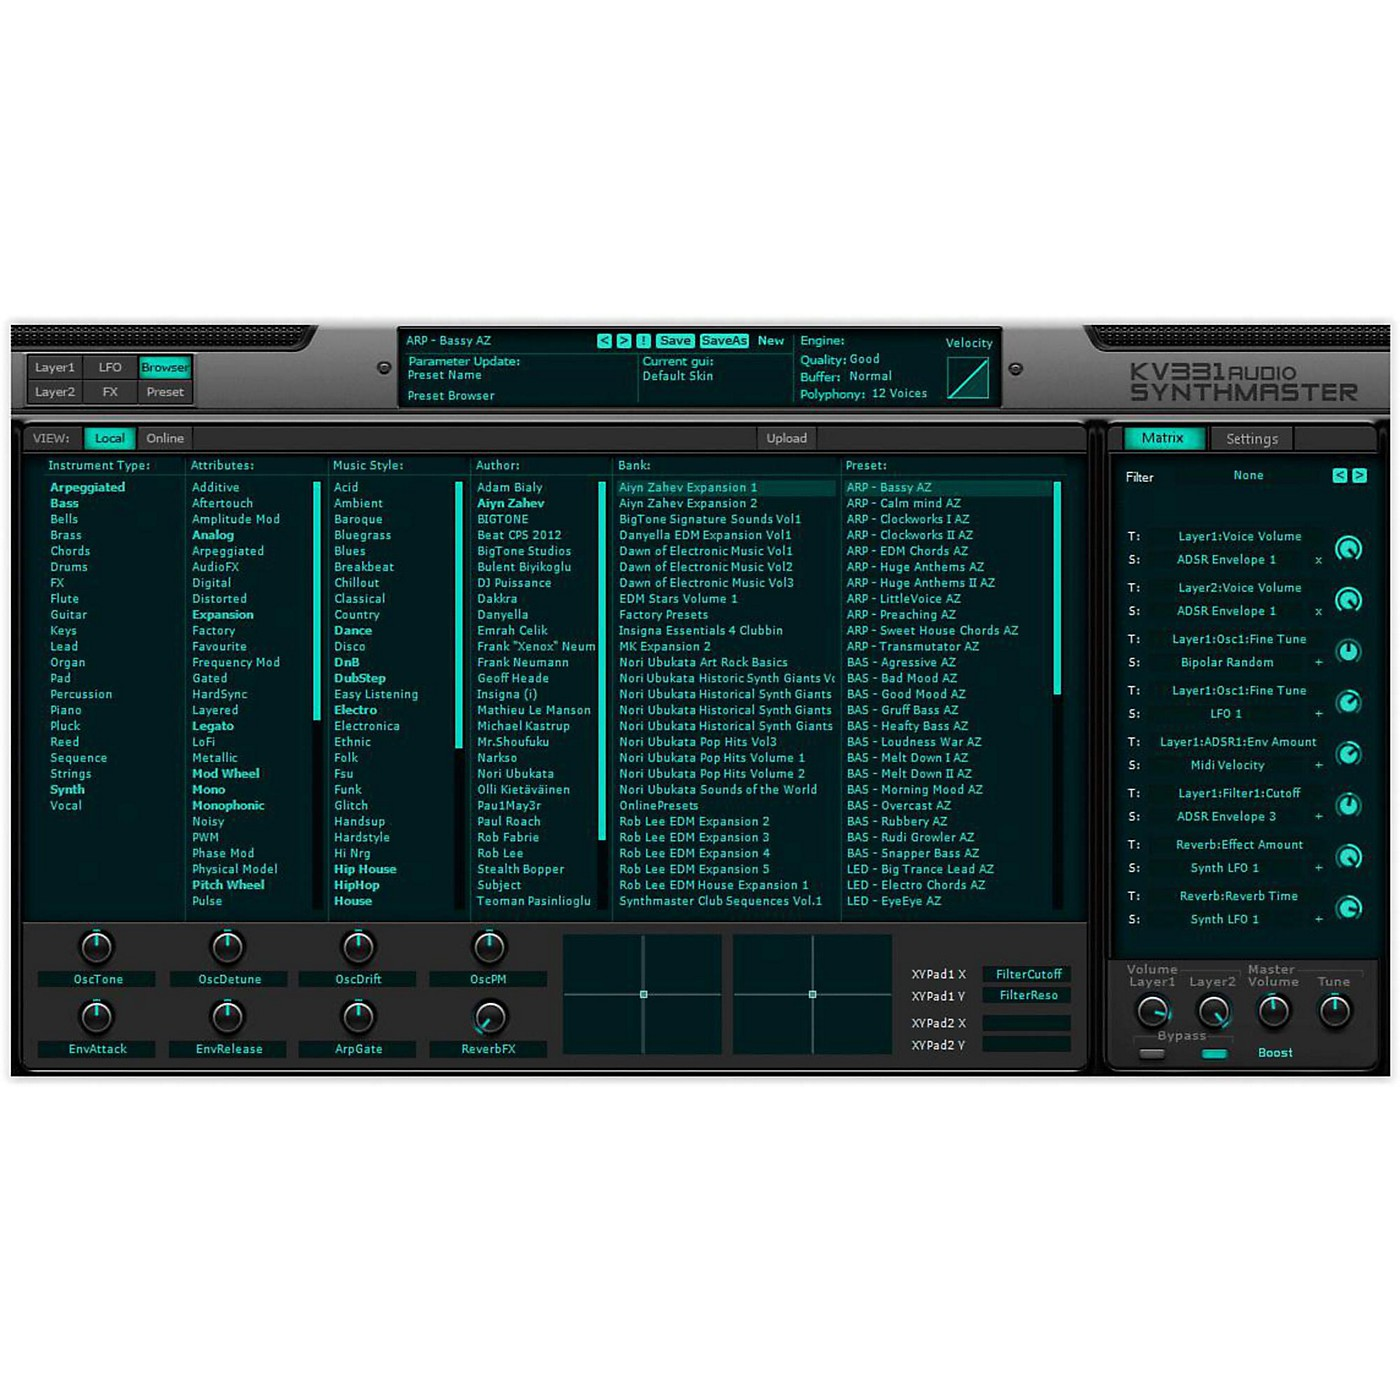 KV331 Audio SynthMaster Bundle Upgrade from SynthMaster Standard thumbnail